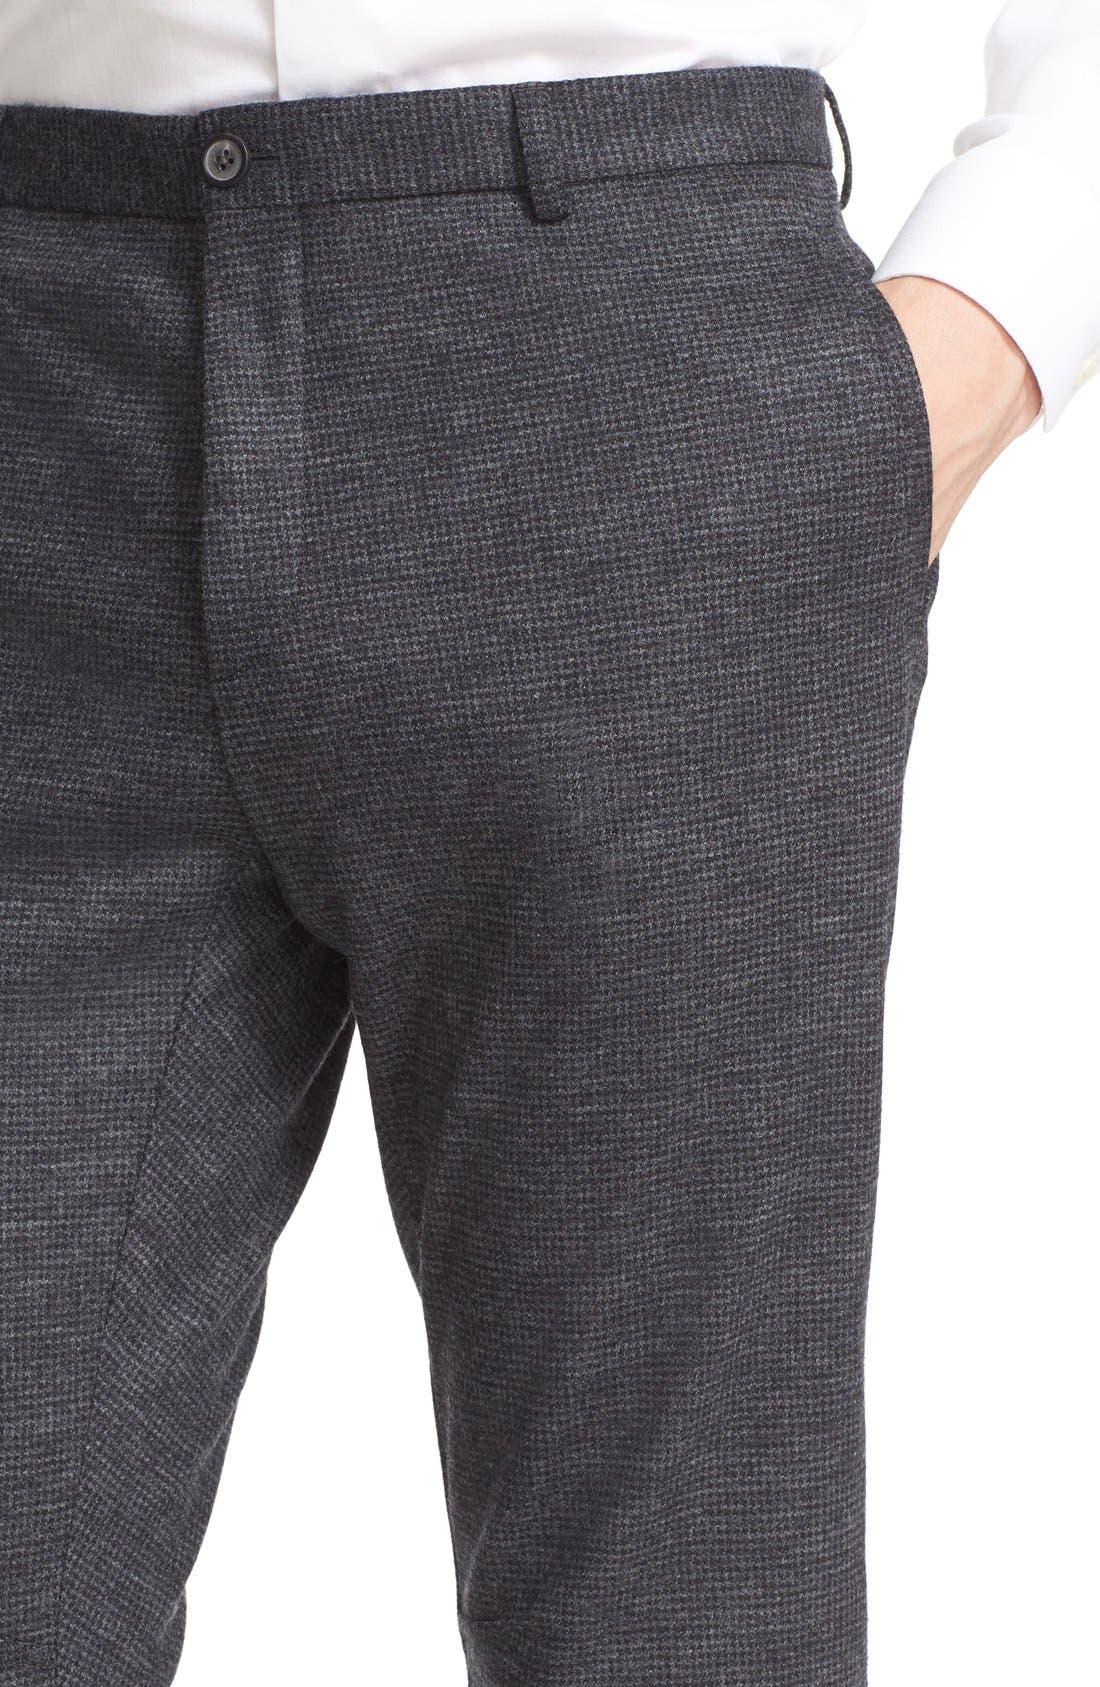 LANVIN, Microcheck Moto Pants, Alternate thumbnail 4, color, 020